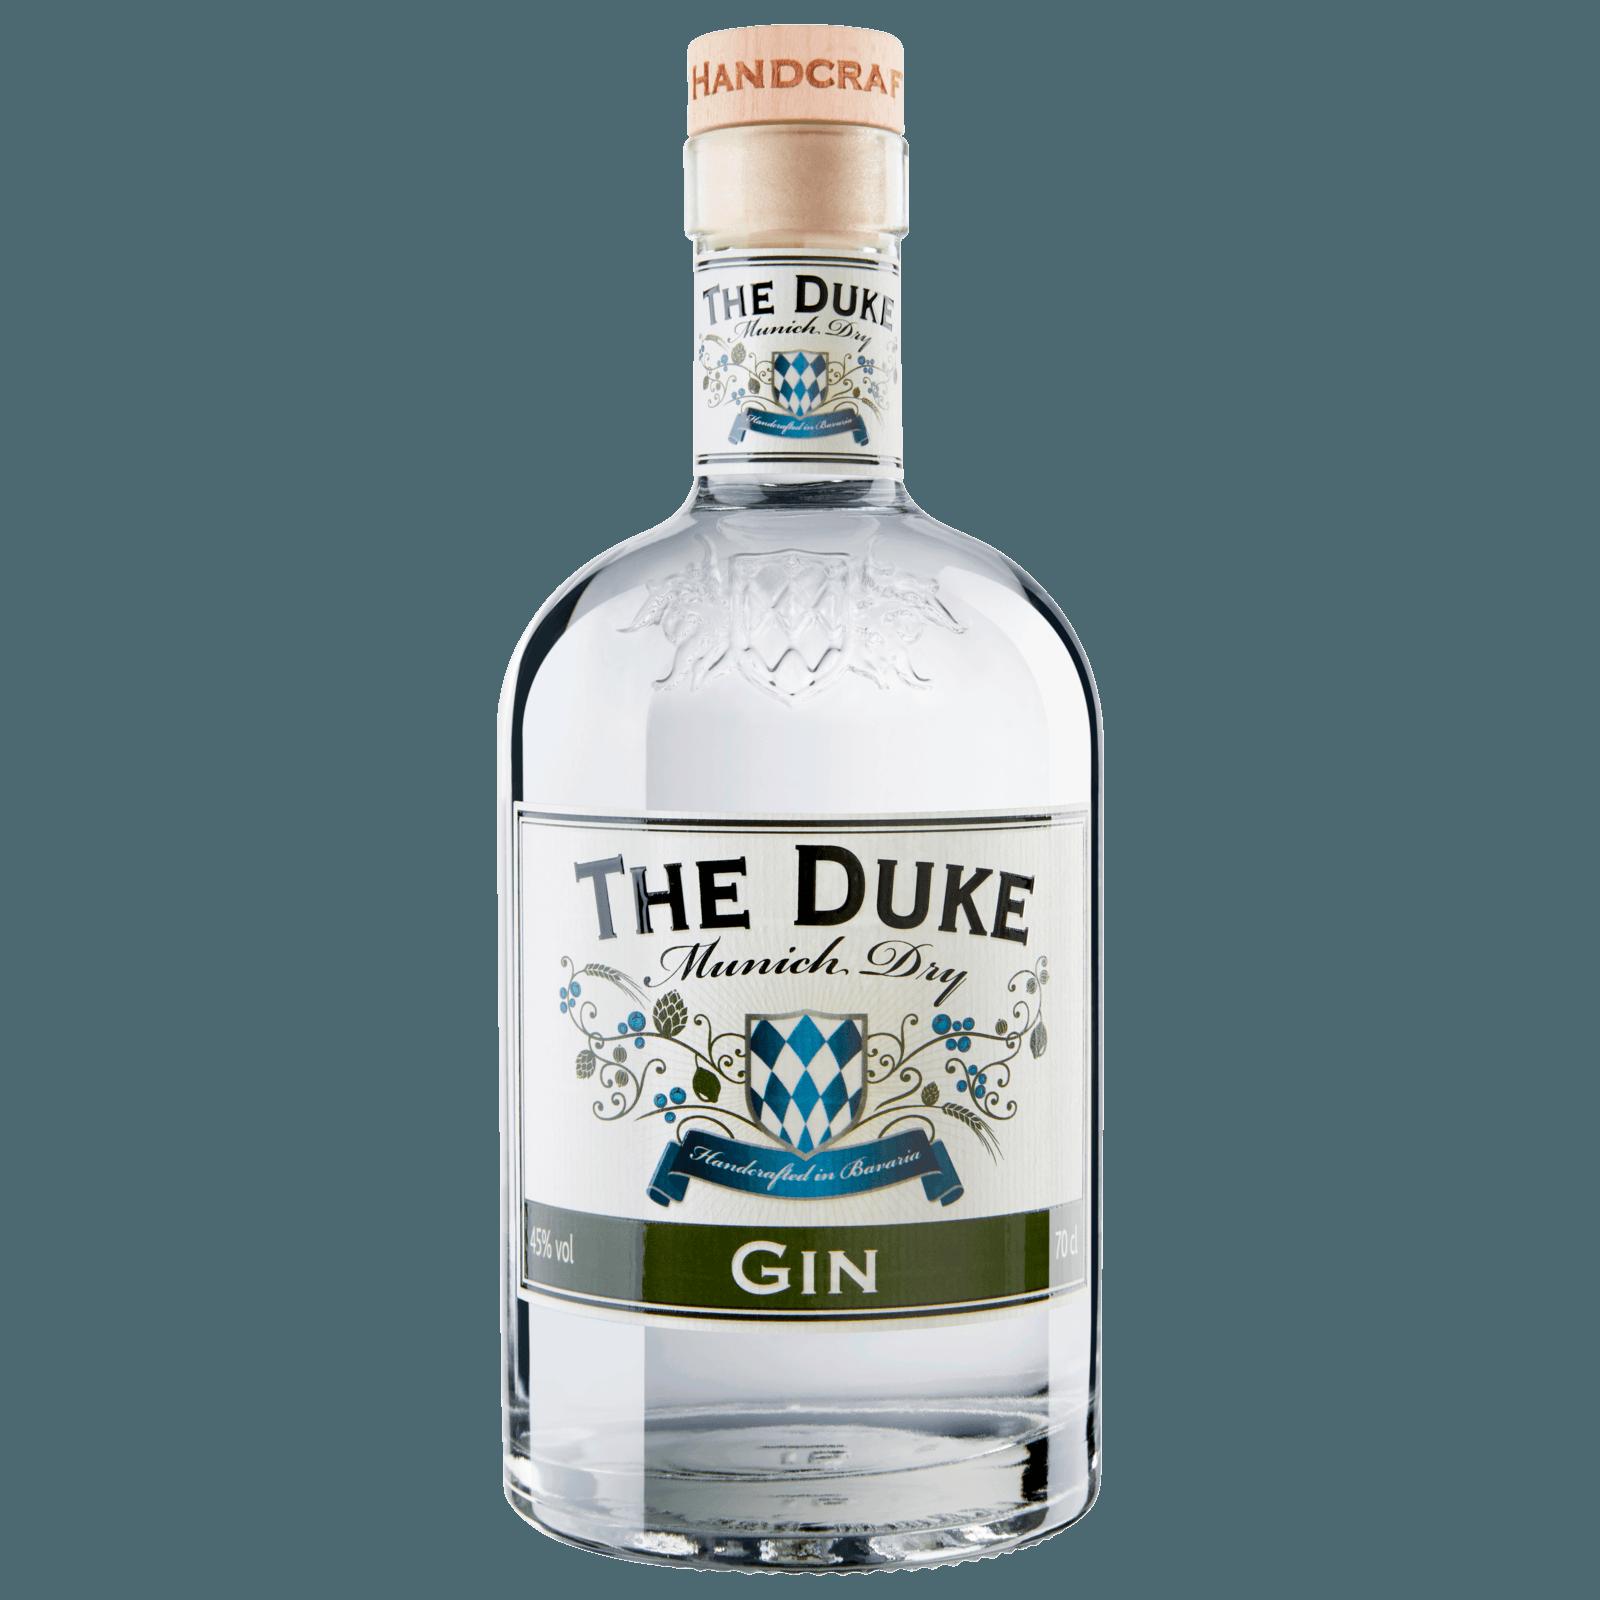 The Duke Munich Dry Gin 0,7l bei REWE online bestellen!